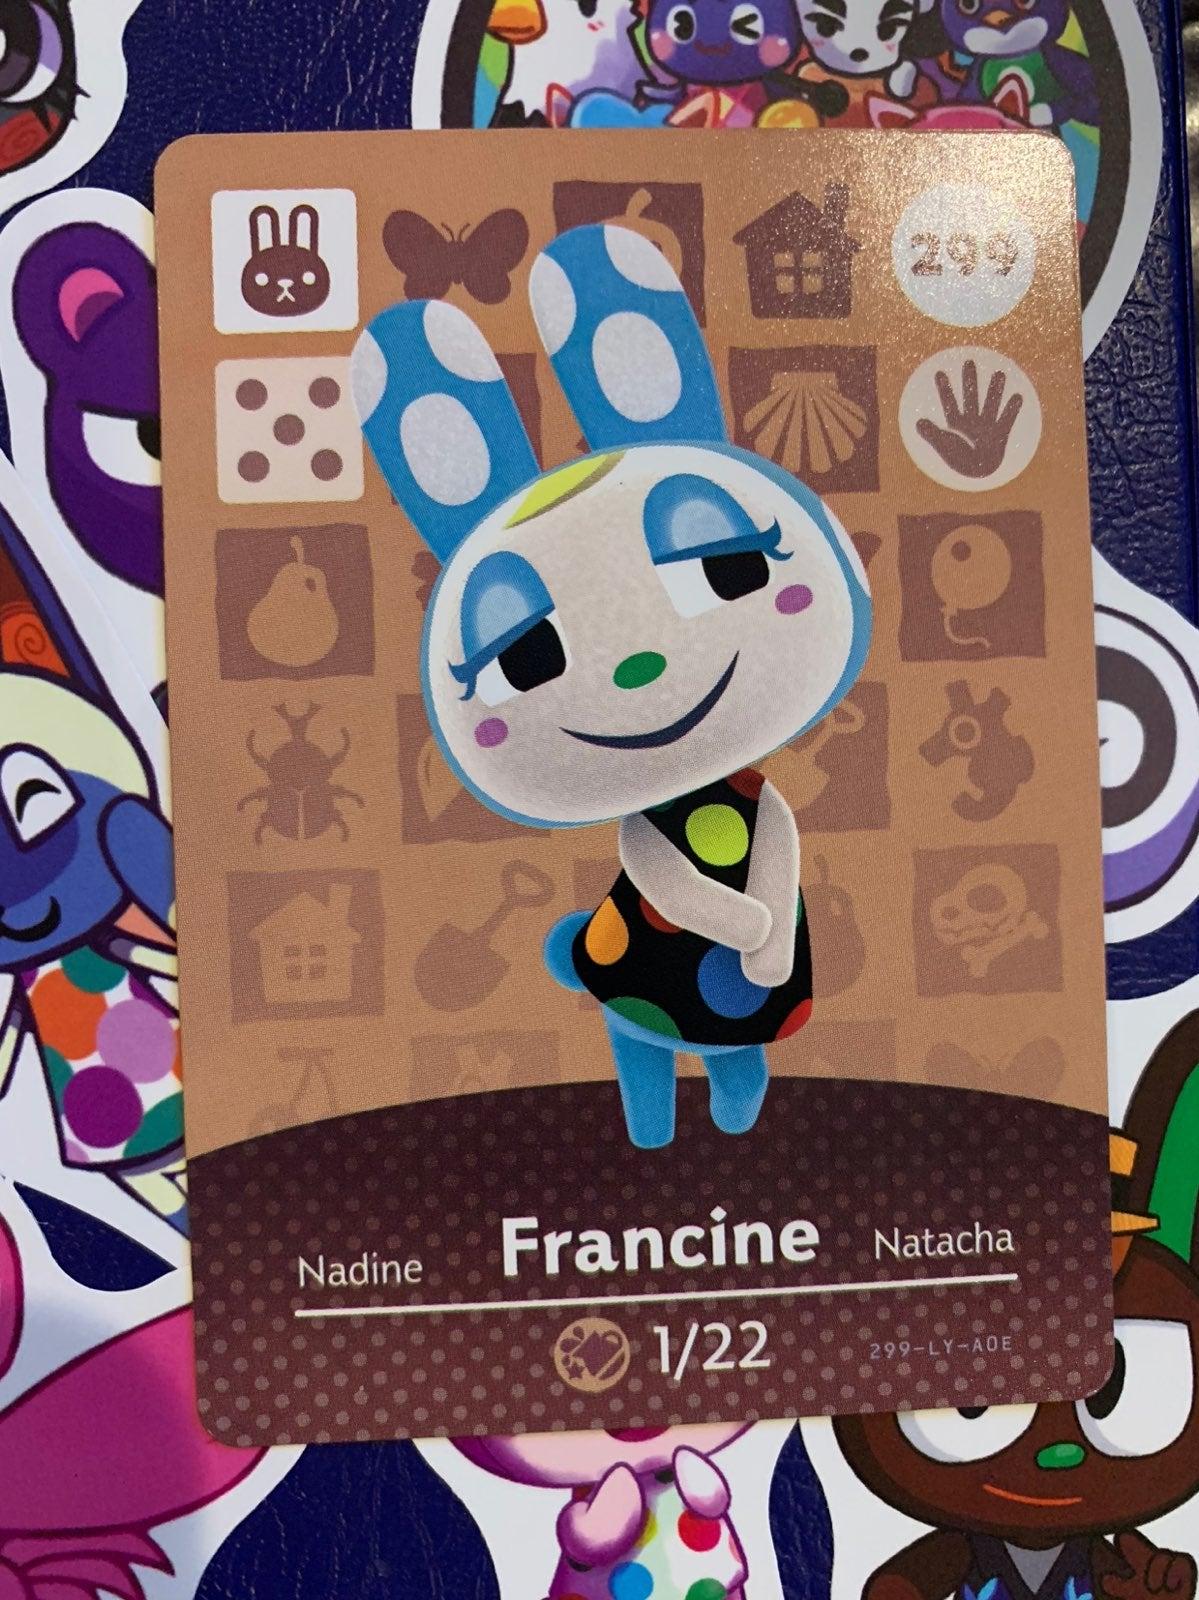 Francine Animal Crossing Amiibo Card